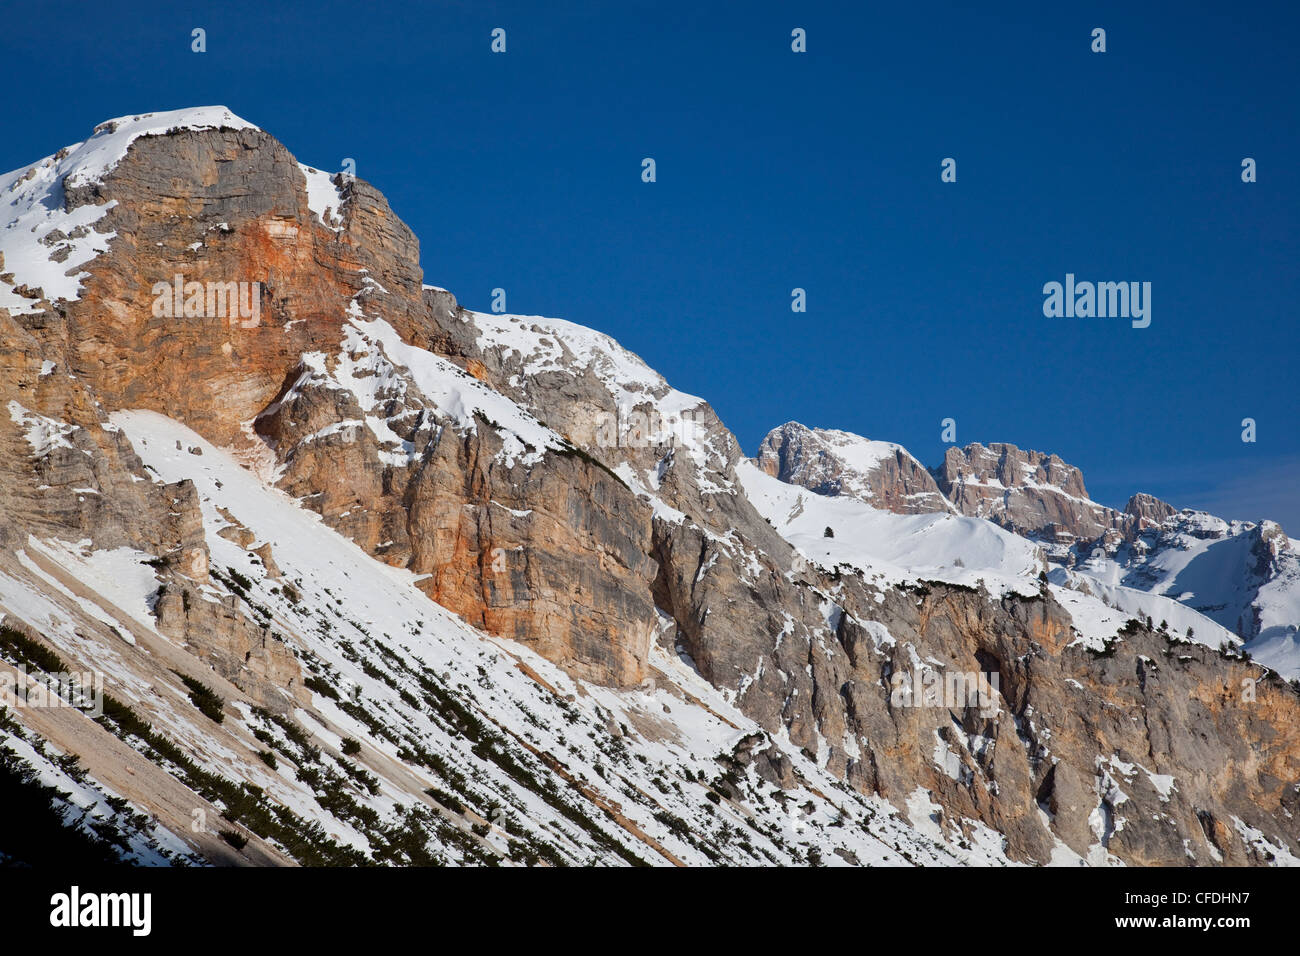 Ski mountaineering in the Dolomites, Cortina d'Ampezzo, Belluno, Italy, Europe - Stock Image